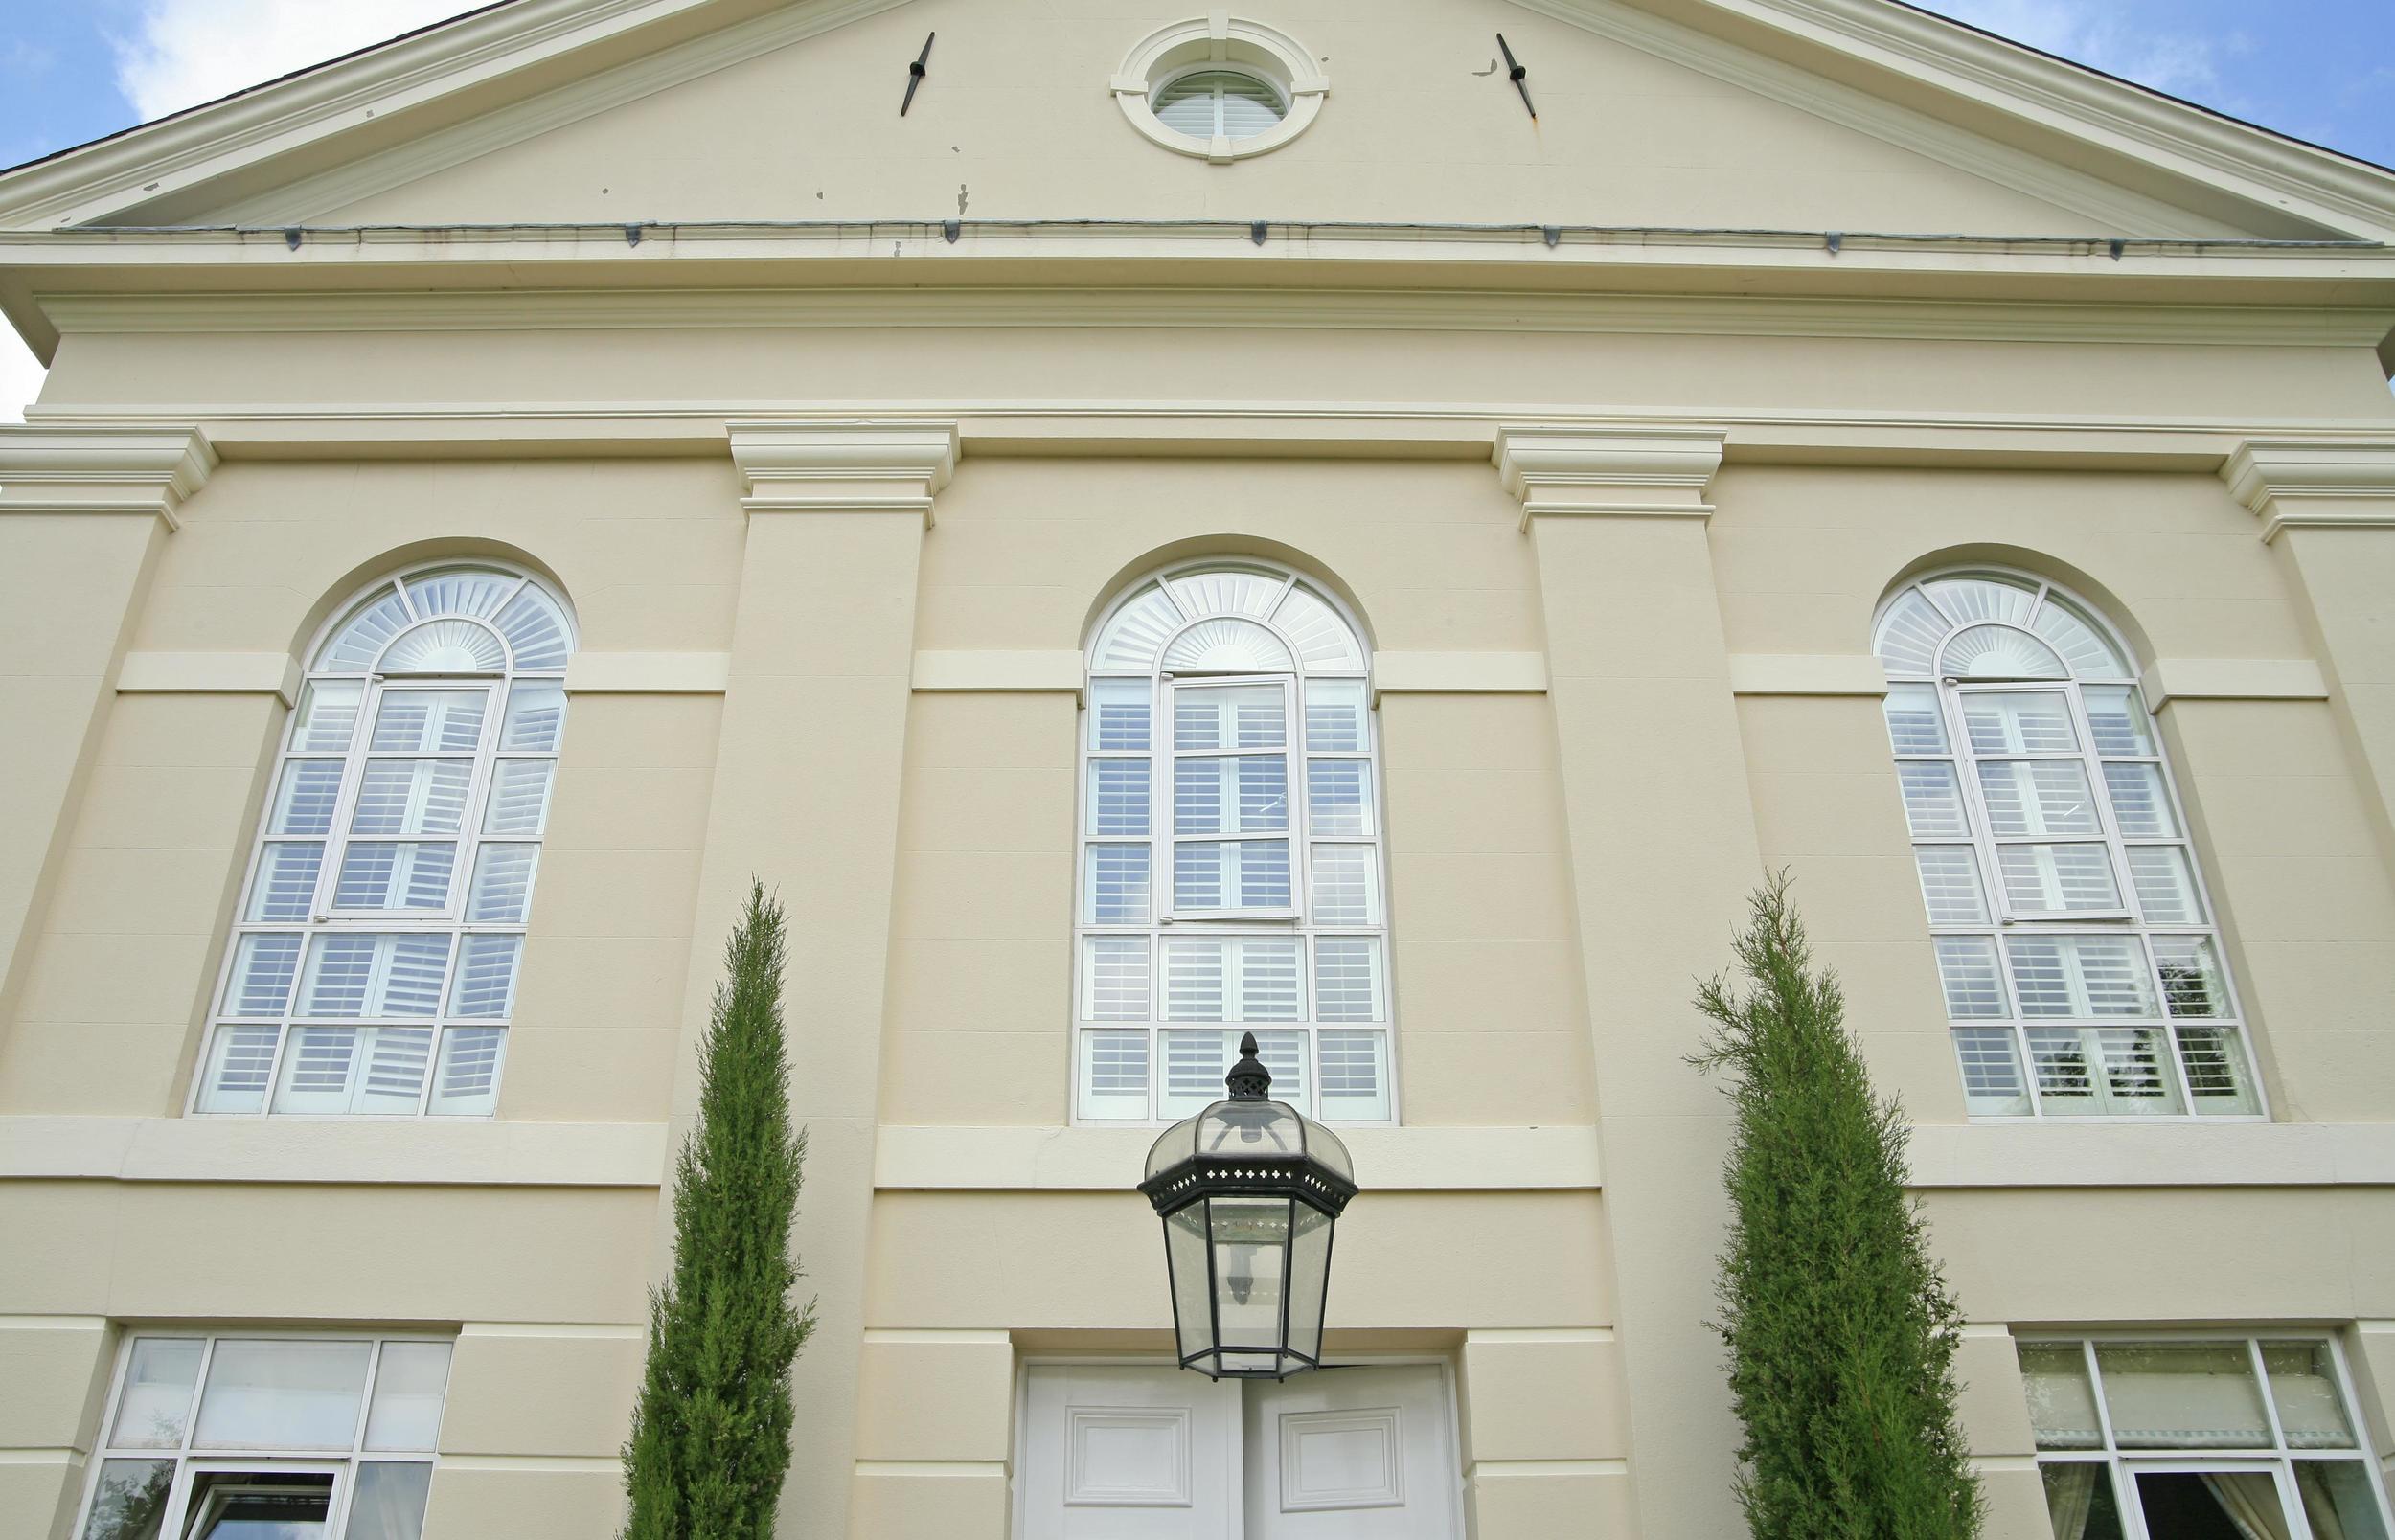 exterior-view-of-shutters.JPG